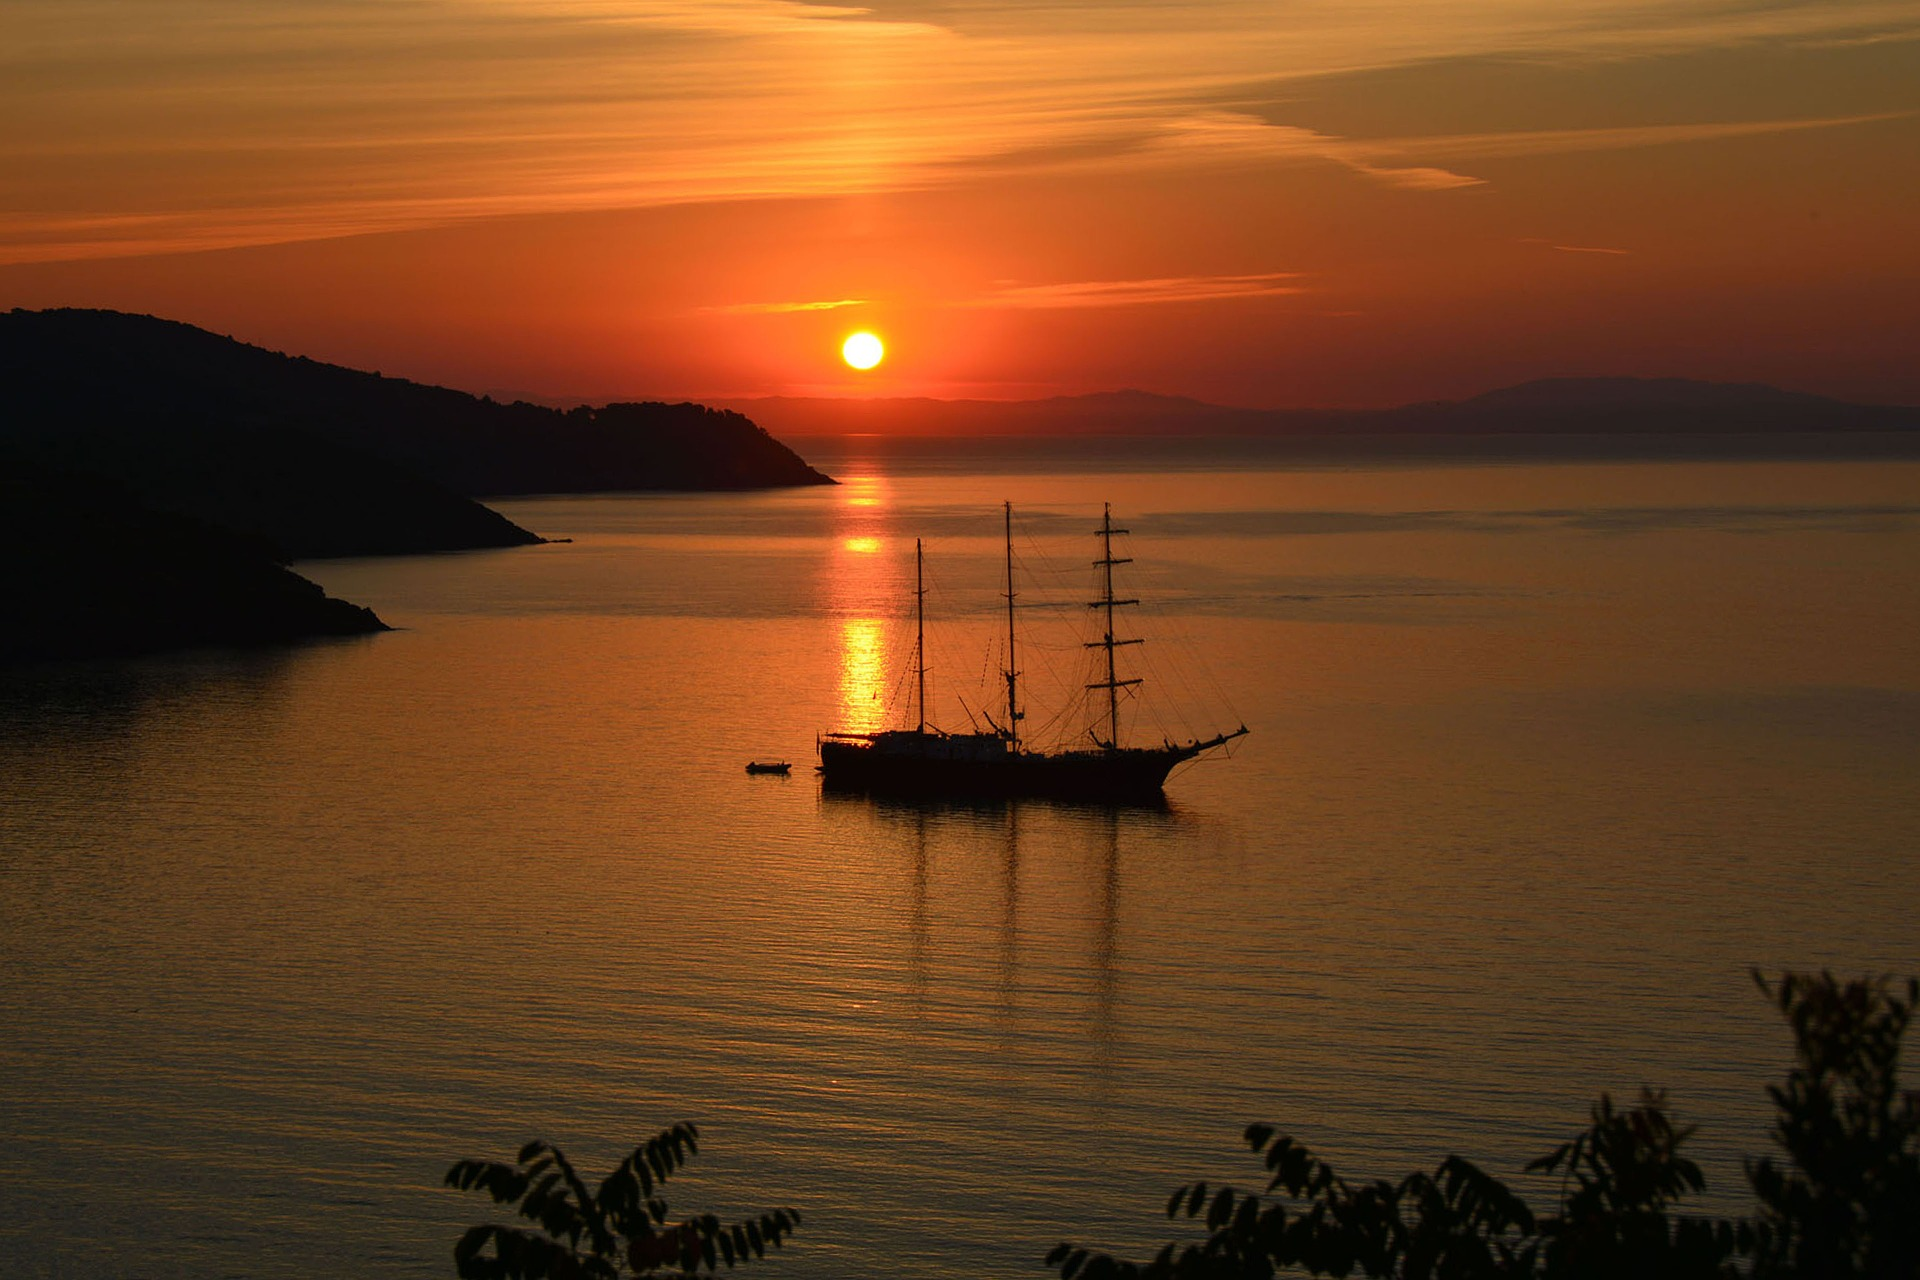 sunset-1076414_1920